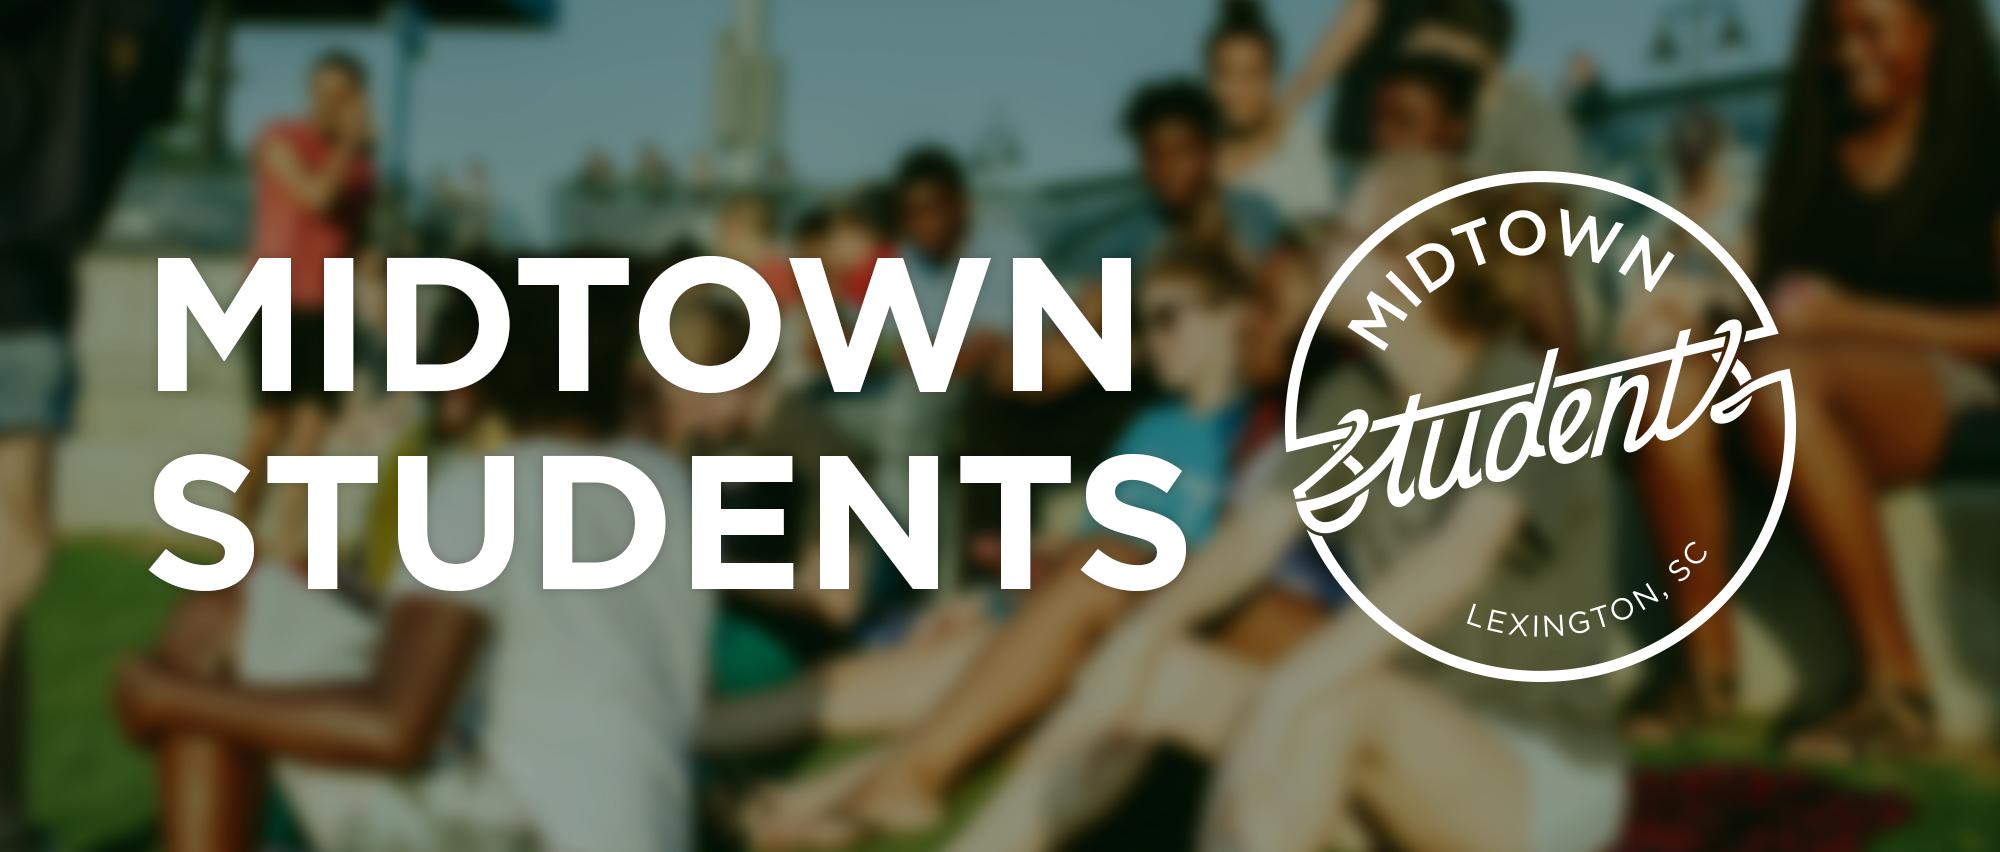 Midtown Students Summer web.jpg